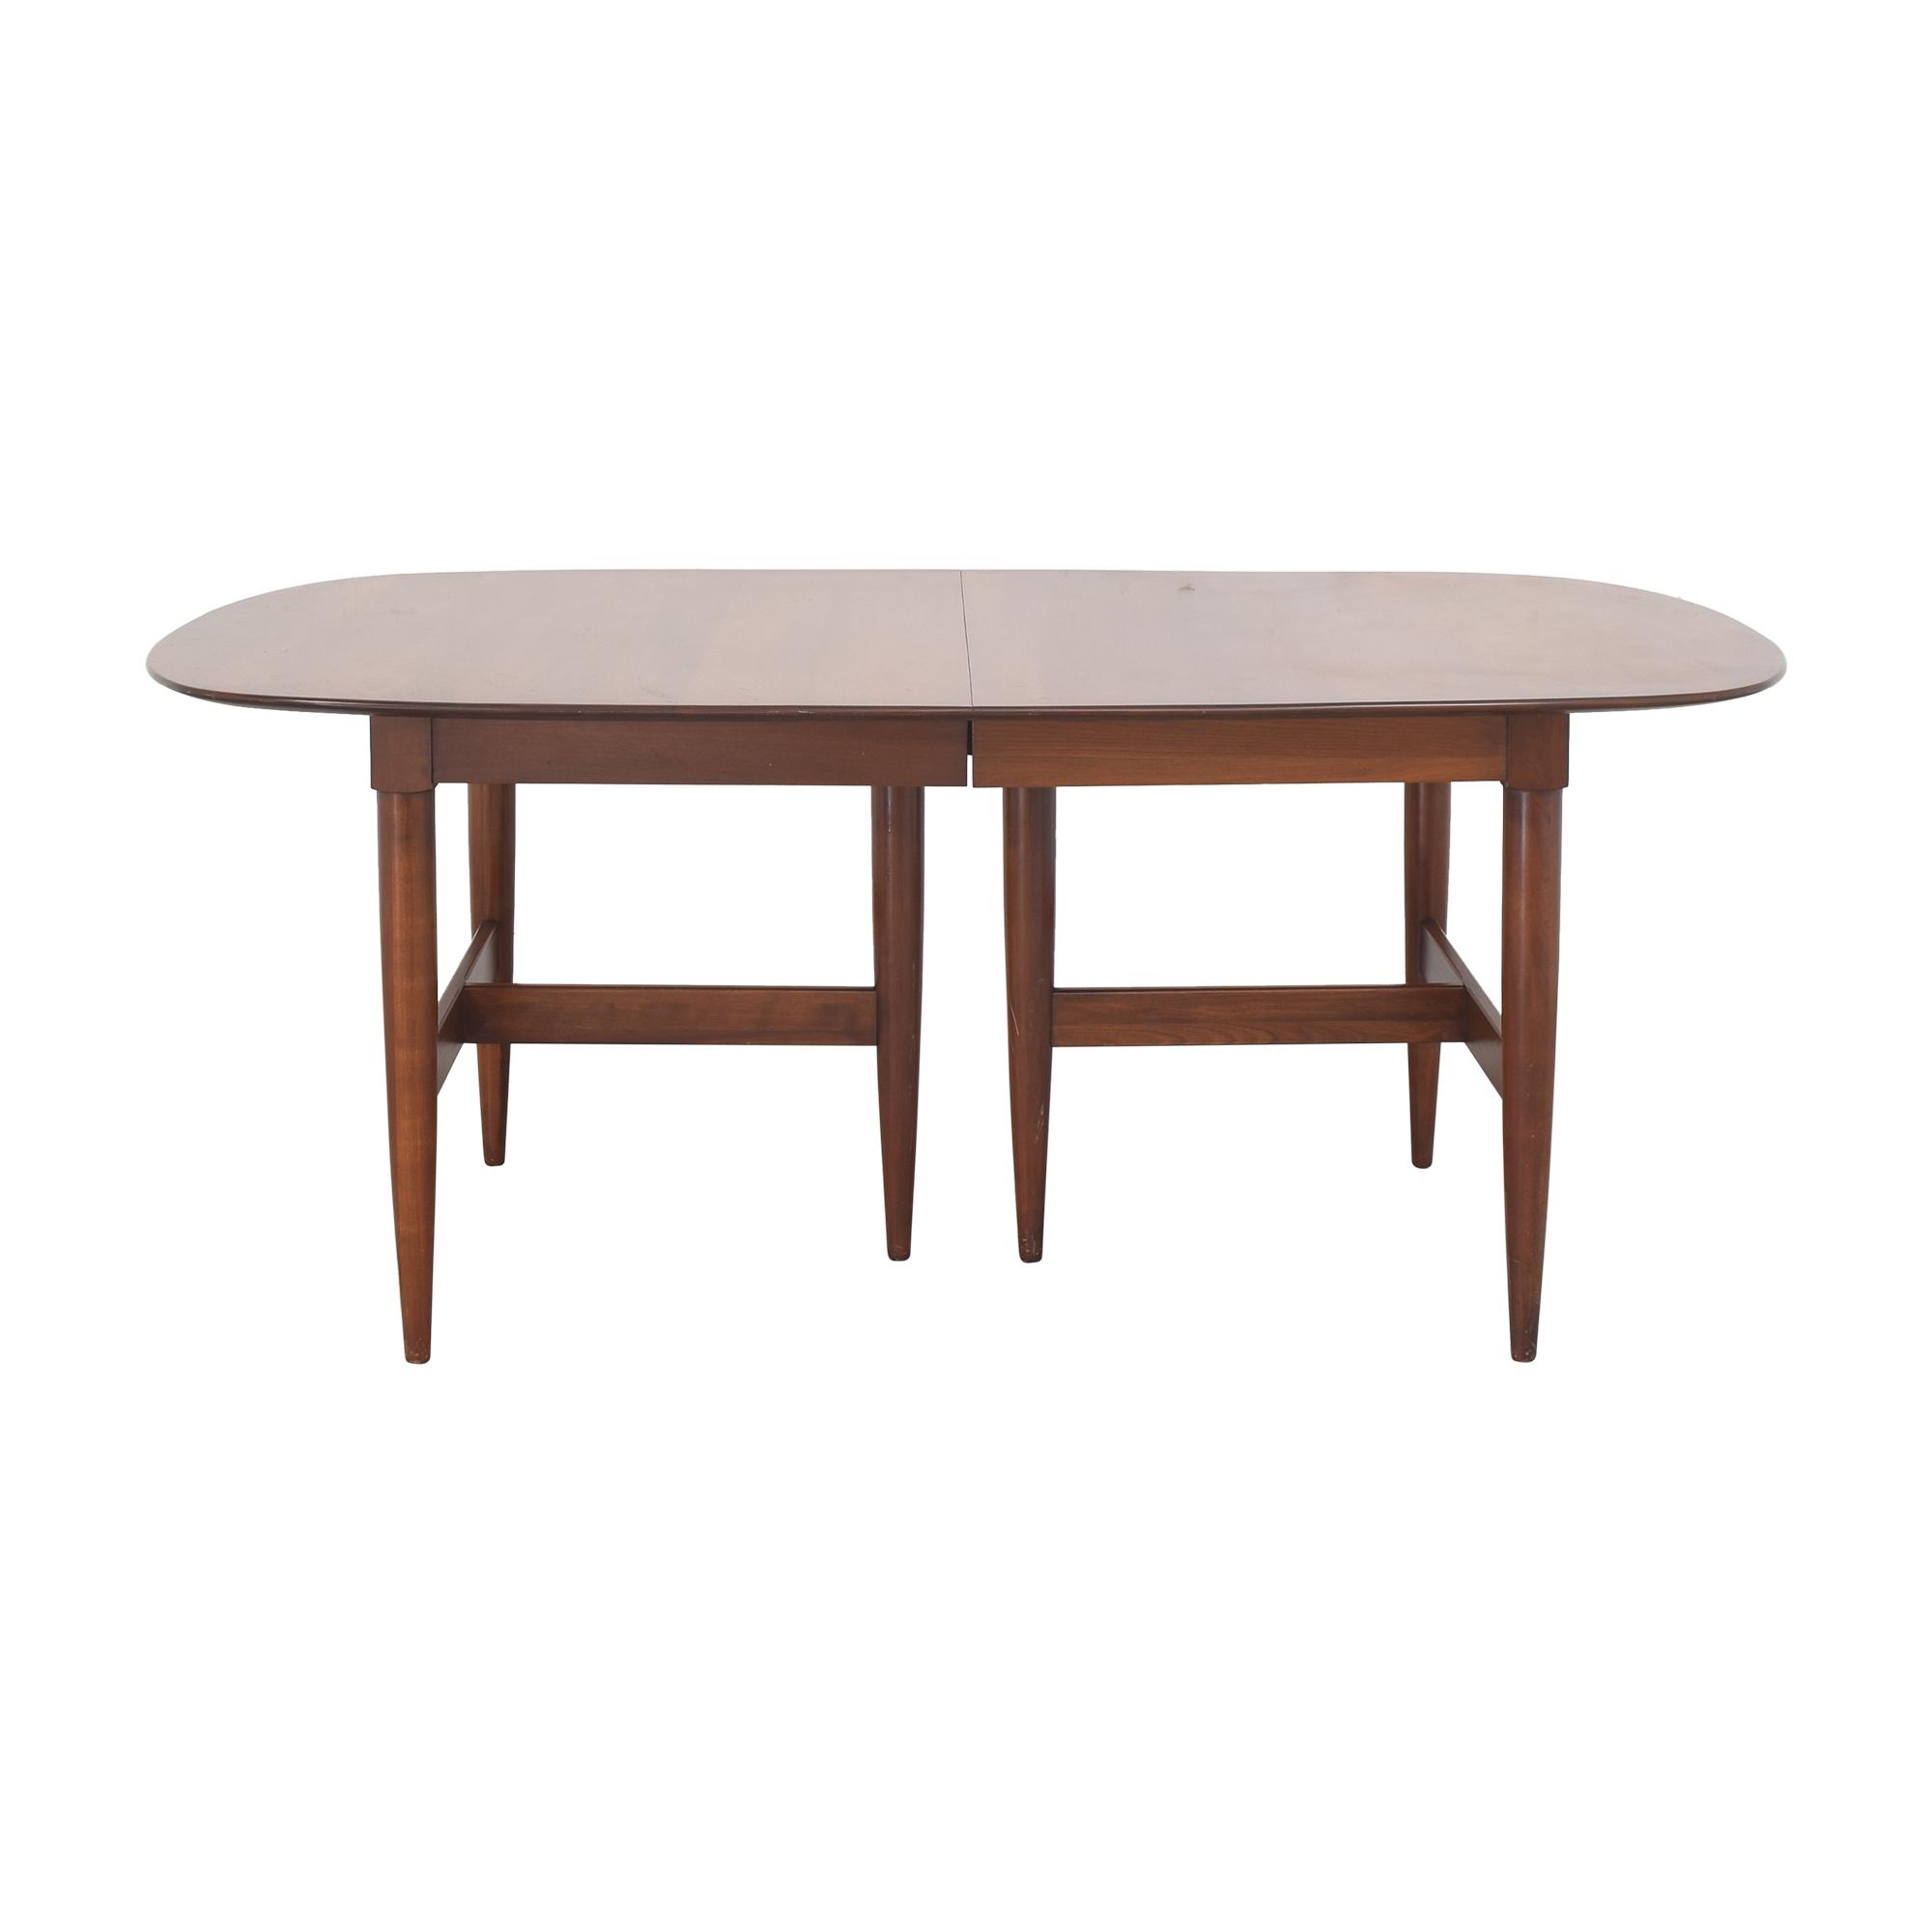 Willett Furniture Willett Furniture Dining Table price